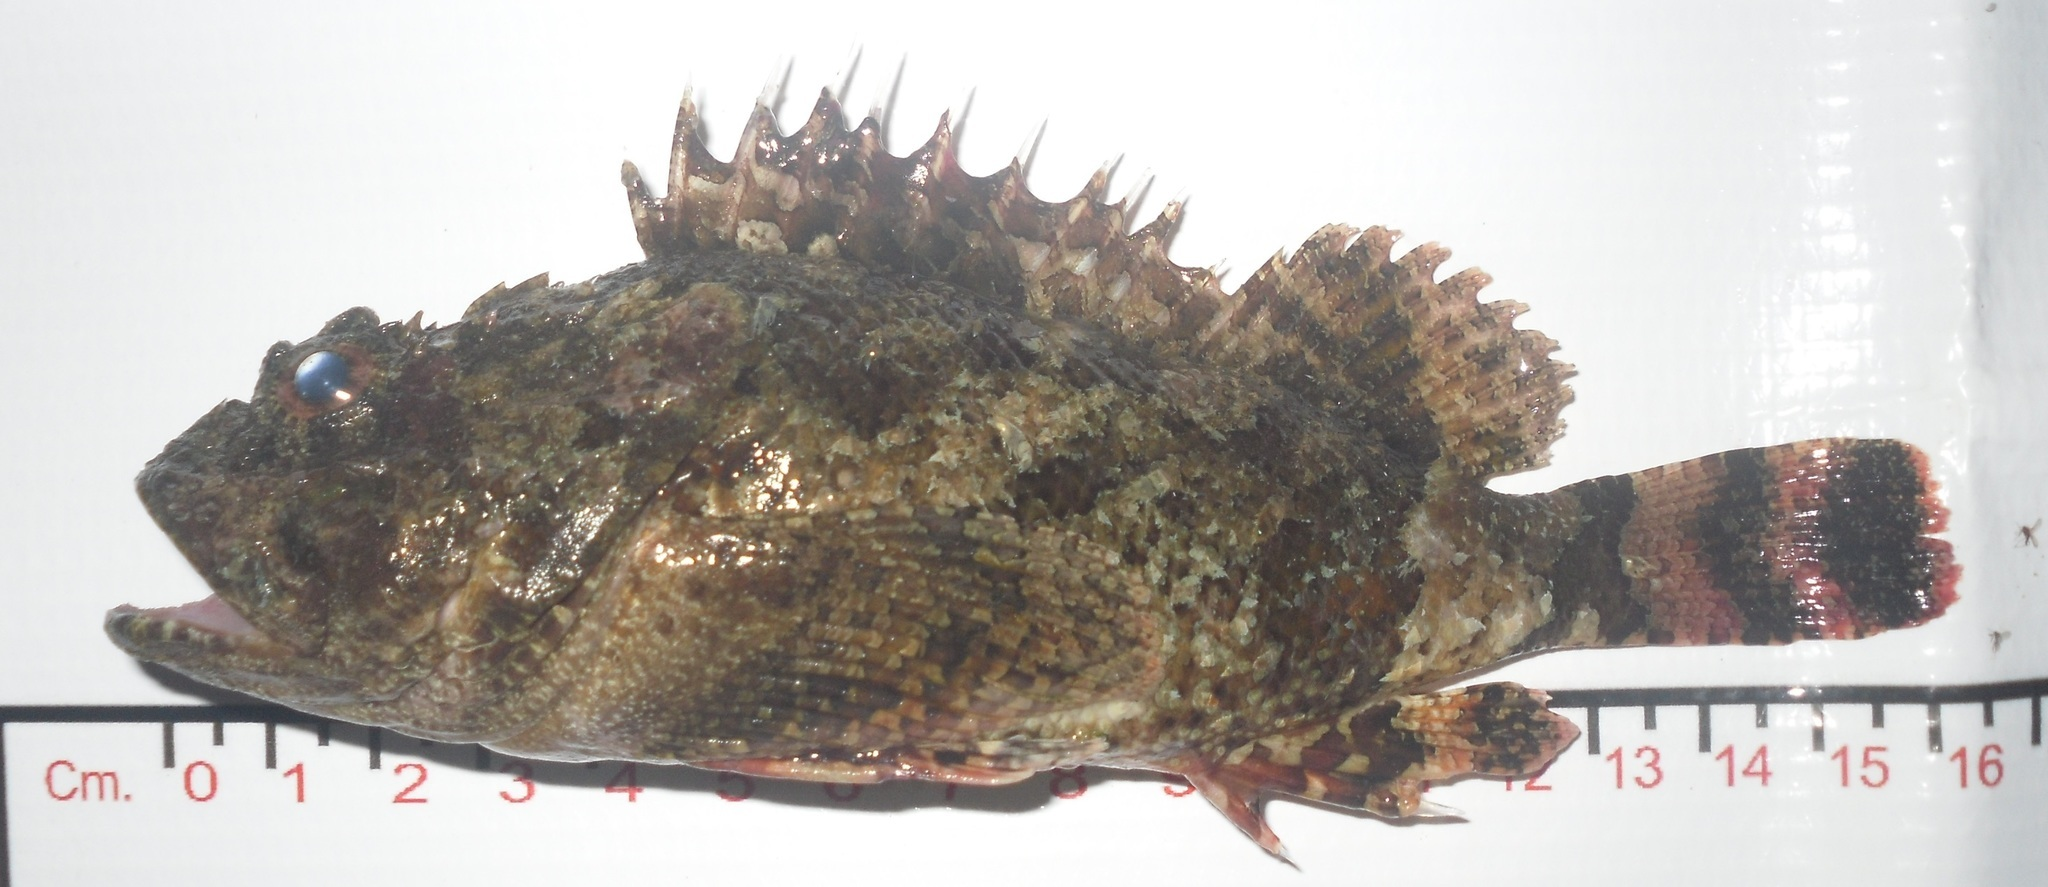 Image of rainbow scorpionfish